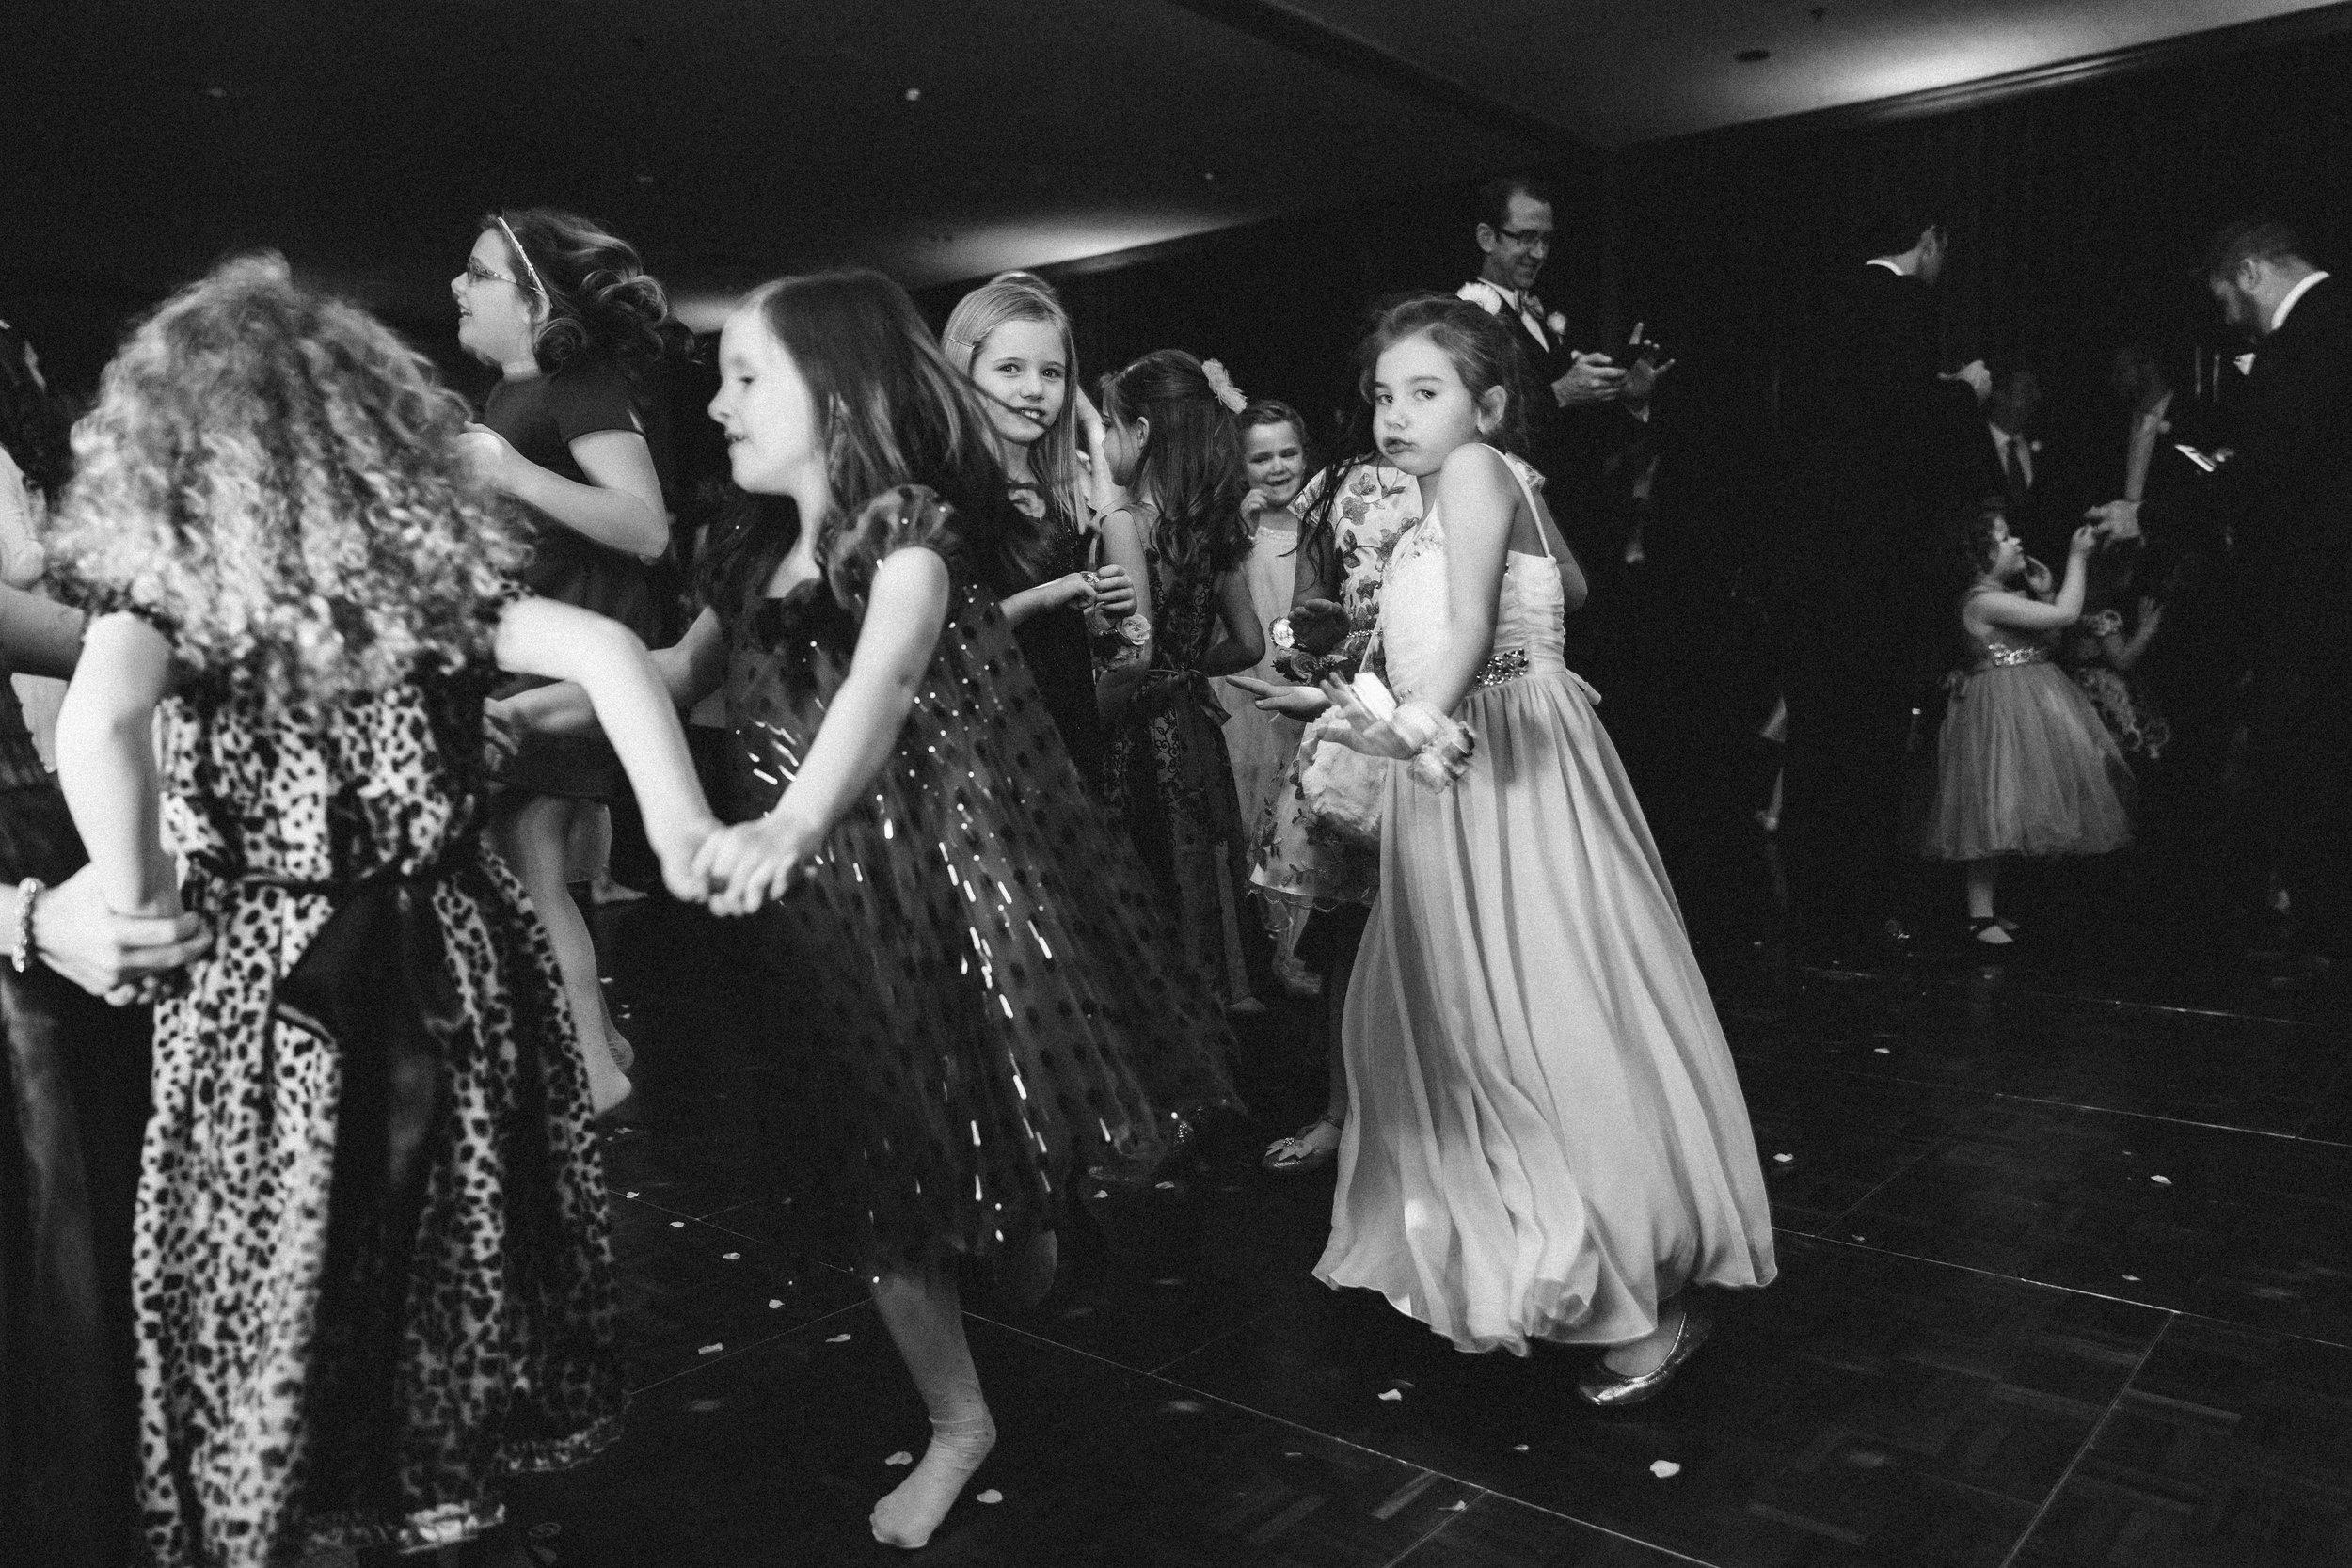 quailcreek_fatherdaughterdance_2017_highfivemedia_photography21.jpg